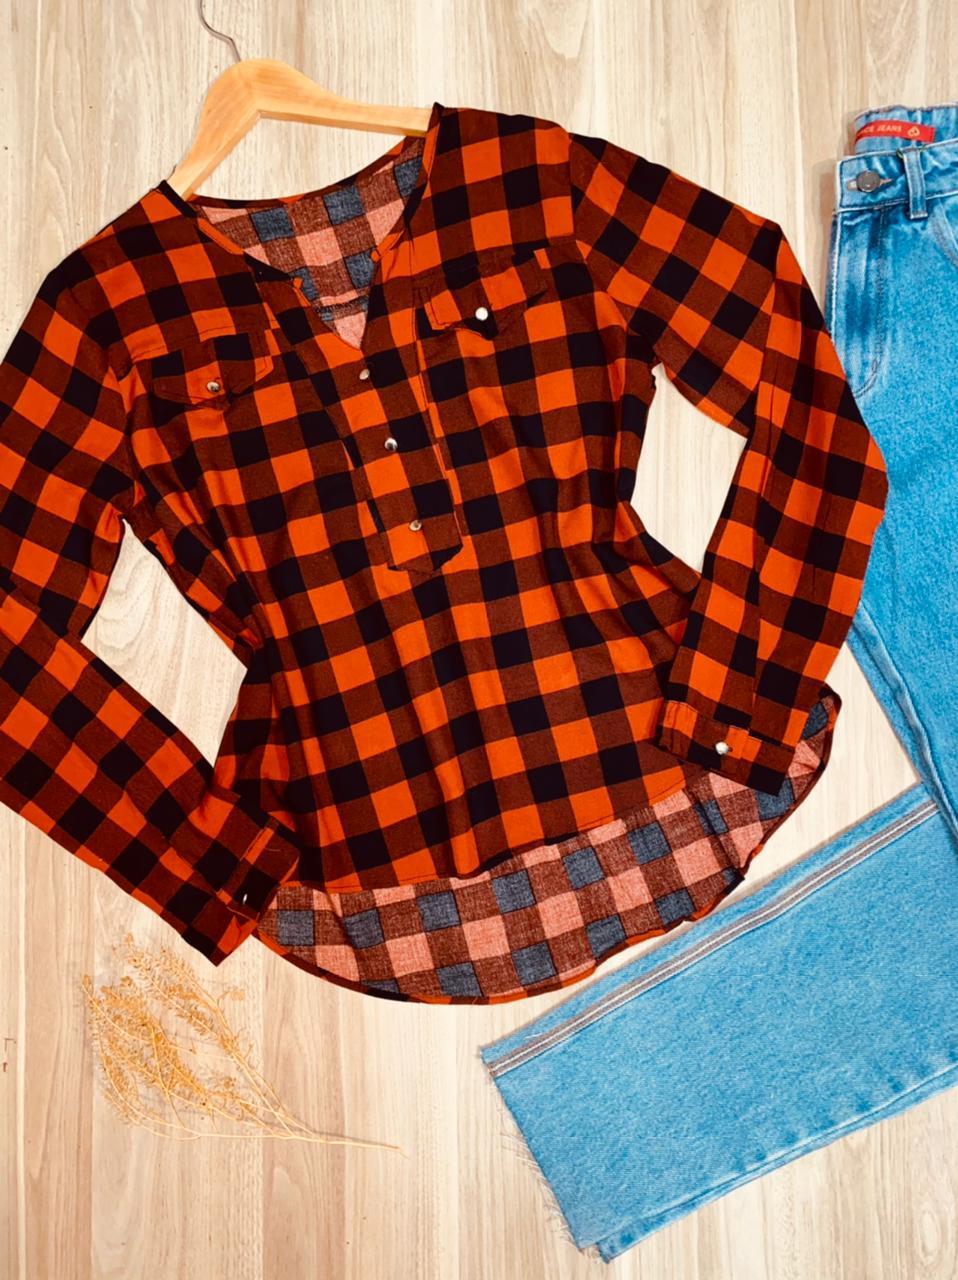 Camisa Manga Longa Decote V com Bolso Falsos Xadrez Terra